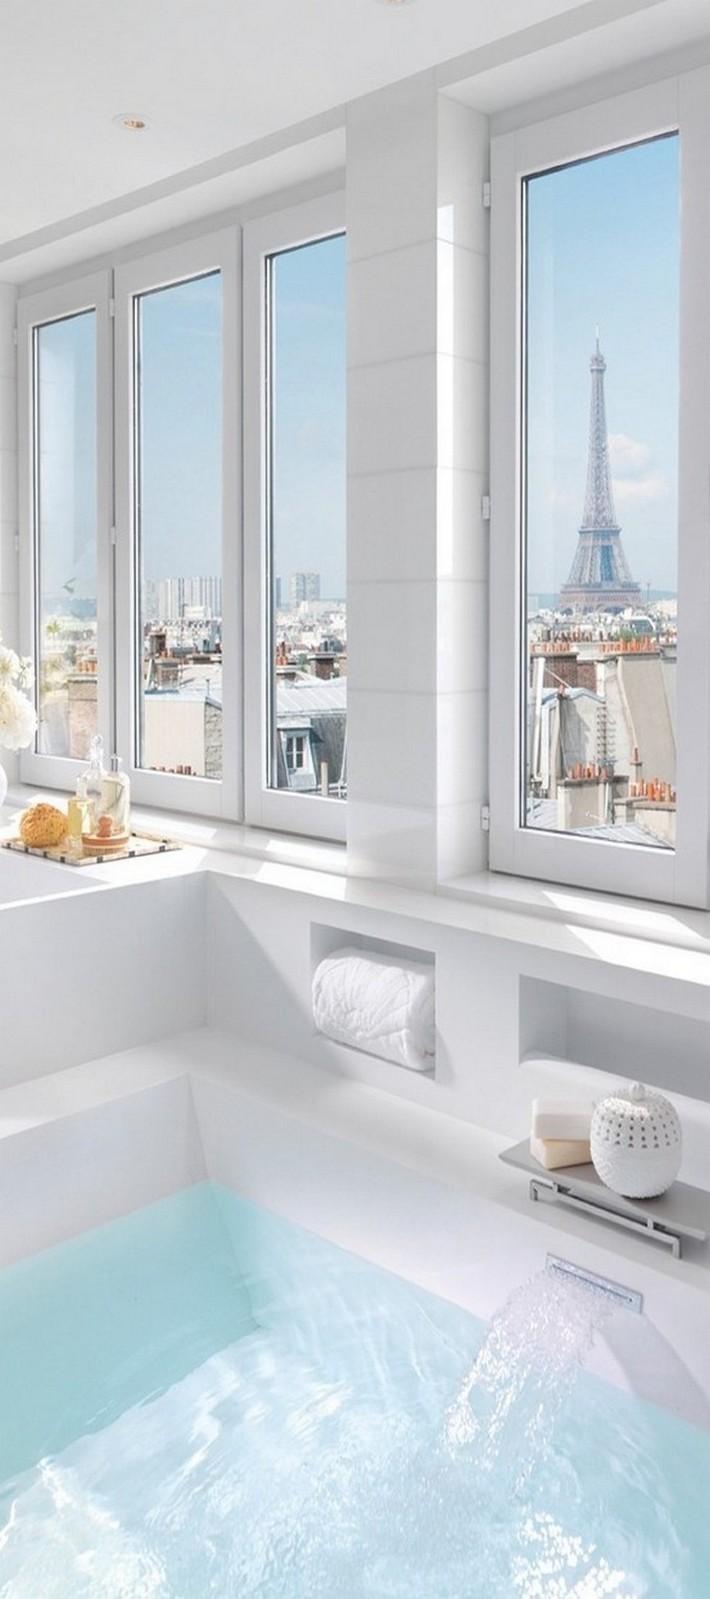 TOP 10 BEAUTIFUL BATHROOMS VIEWS   Inspiration and Ideas ... on Beautiful Bathroom Ideas  id=53977